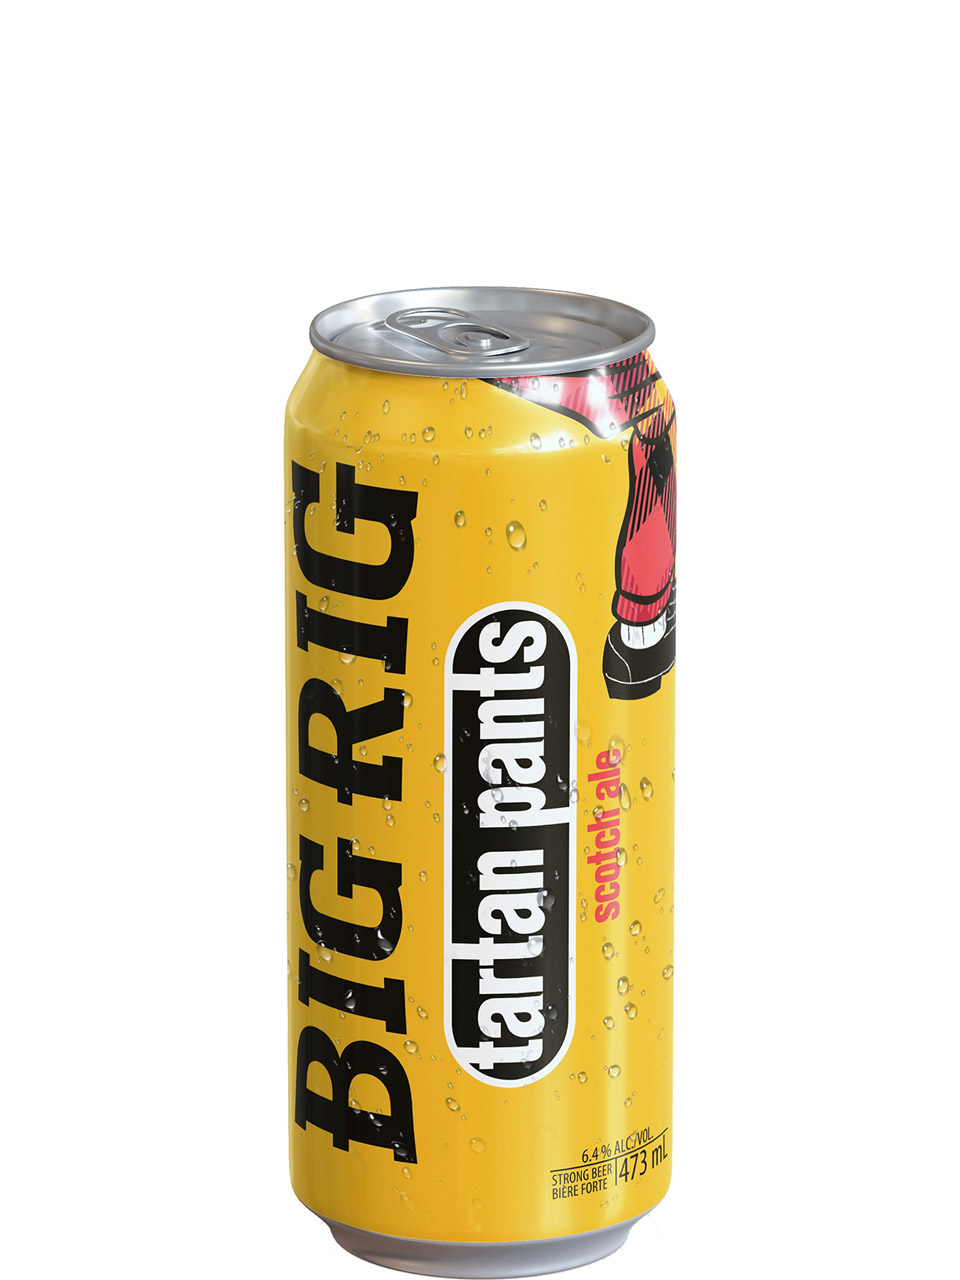 Big Rig Tarten Pants Scotch Ale 473ml Can